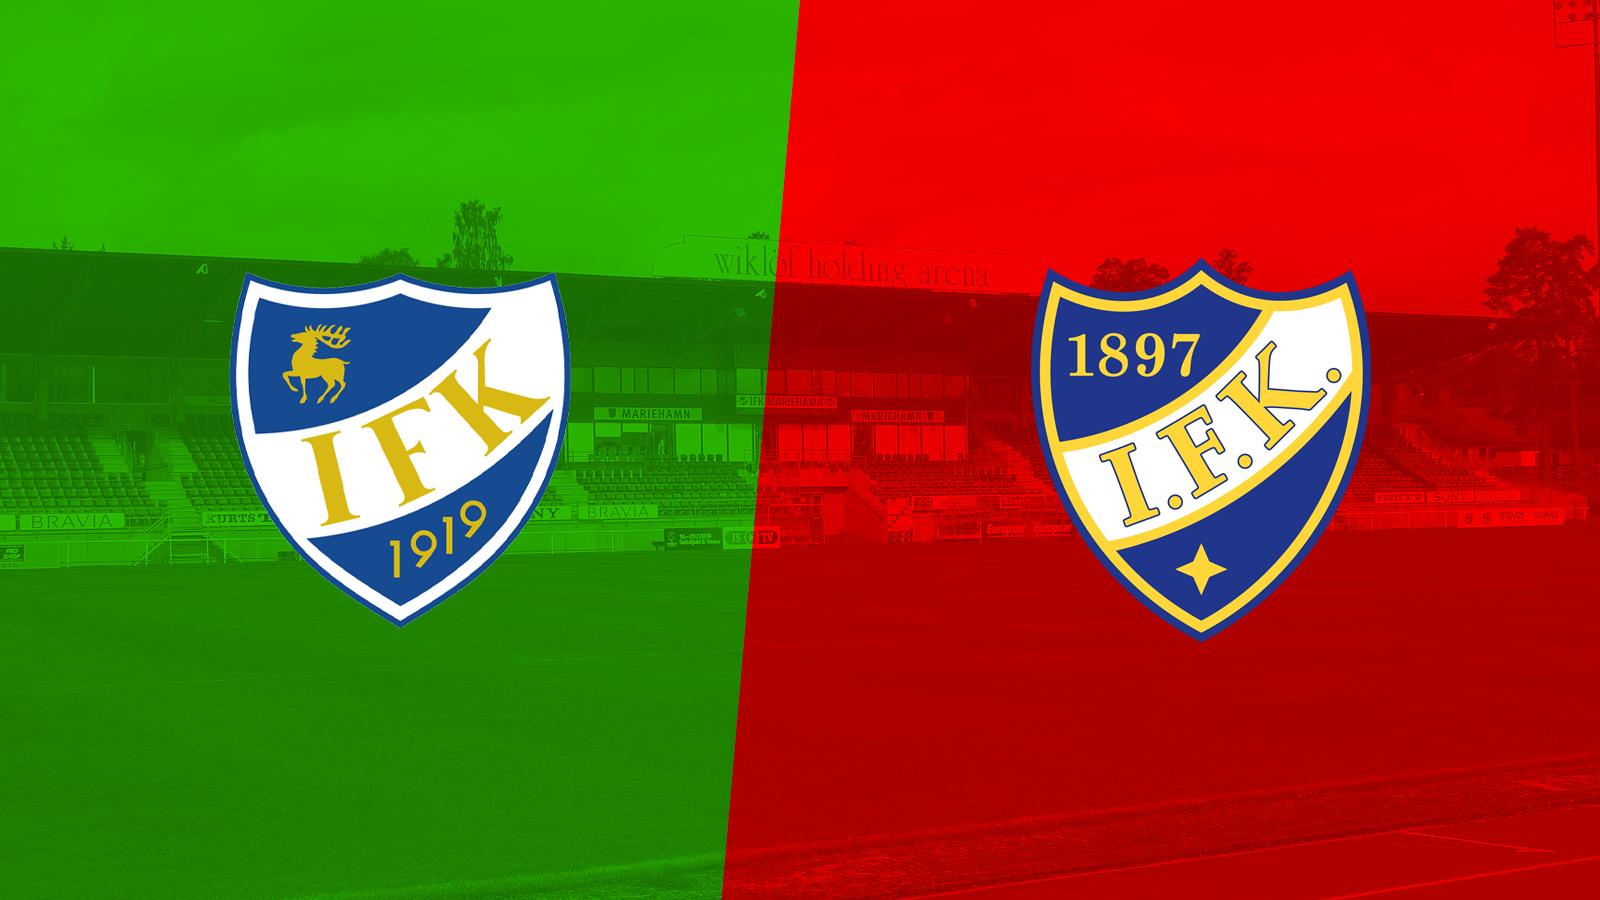 Matchrapport: IFK Mariehamn – HIFK 3-0 (2-0)